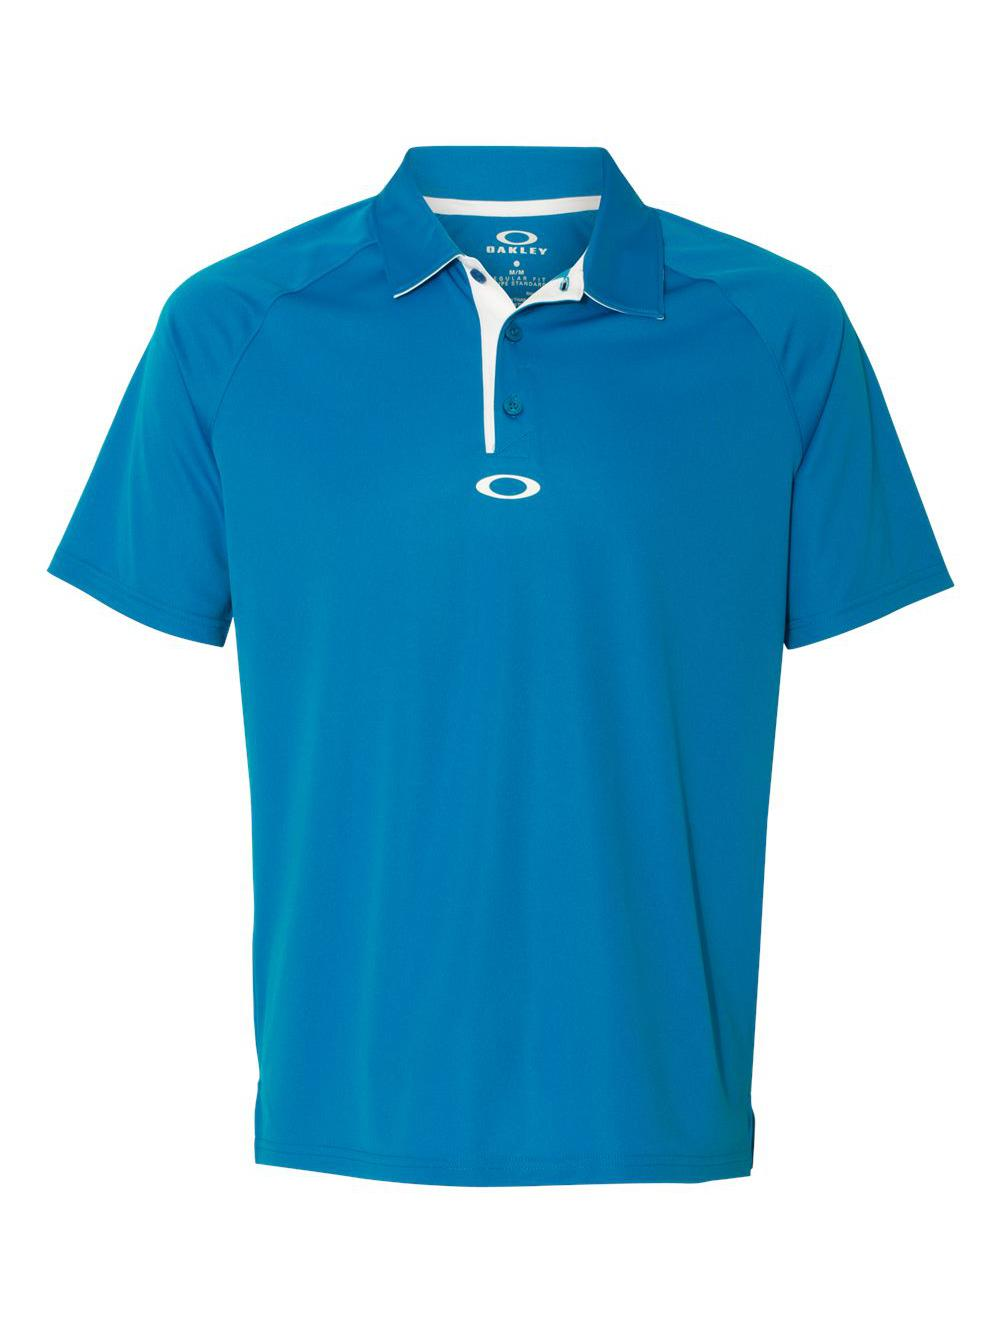 Oakley-Elemental-2-0-Sport-Shirt-432632ODM thumbnail 3